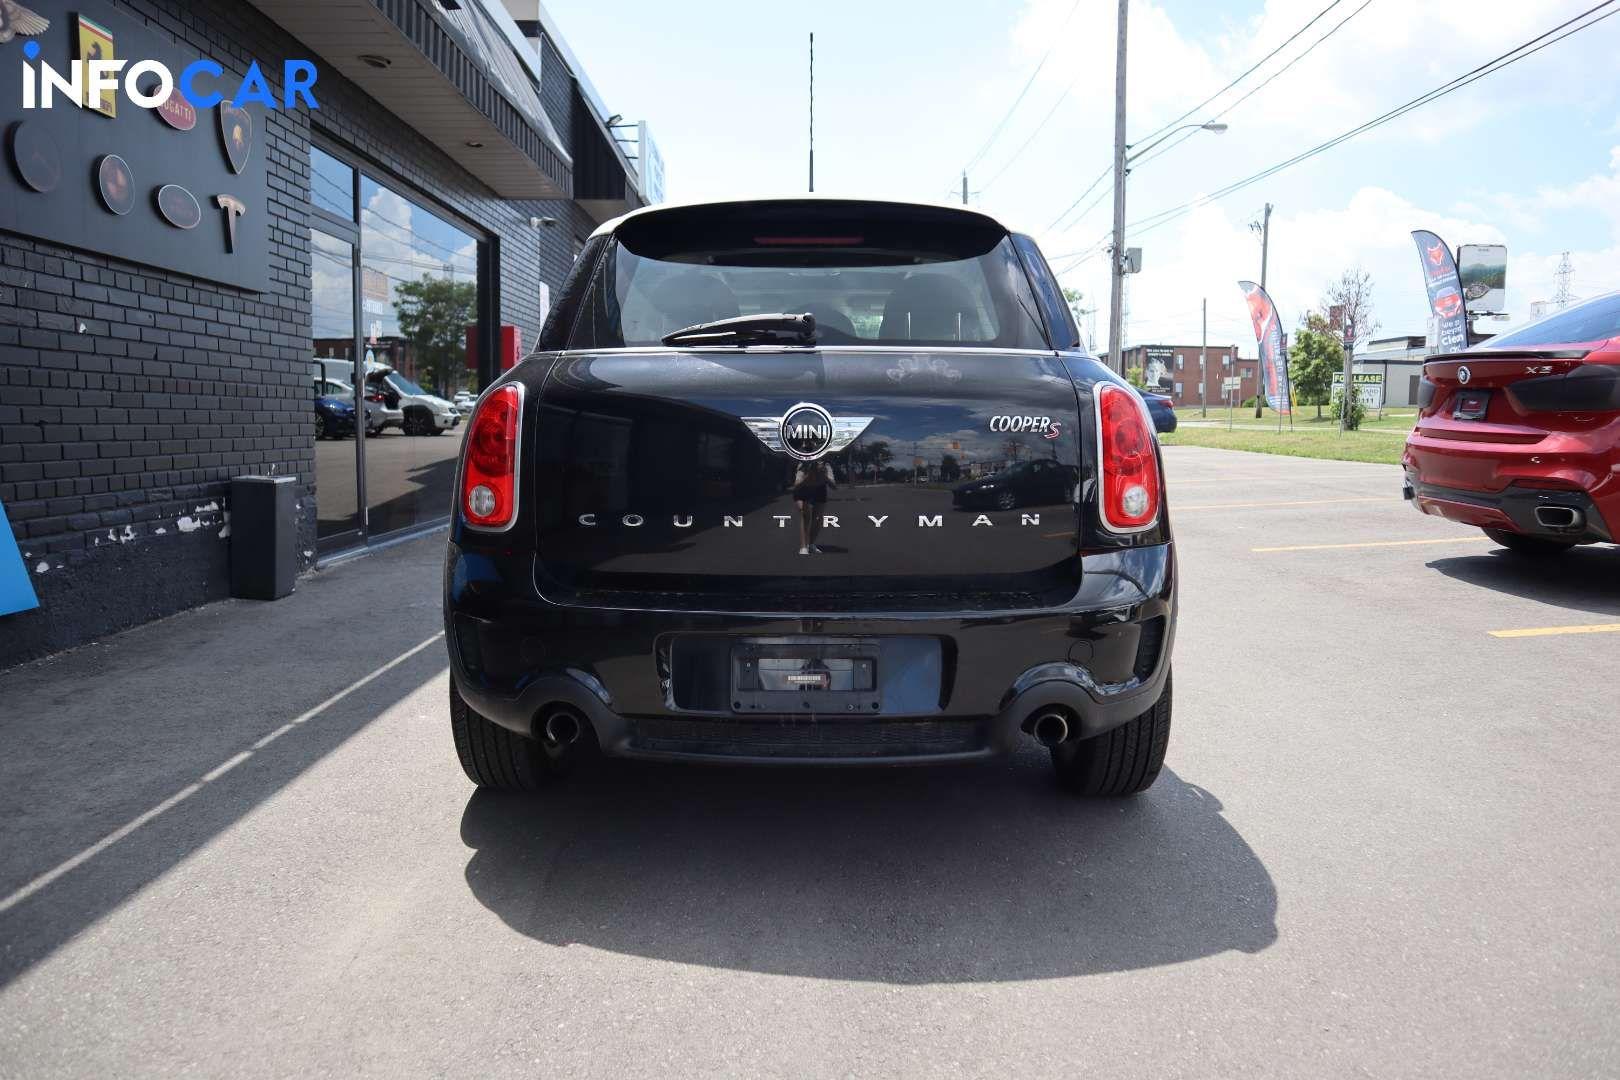 2014 MINI Countryman null - INFOCAR - Toronto's Most Comprehensive New and Used Auto Trading Platform